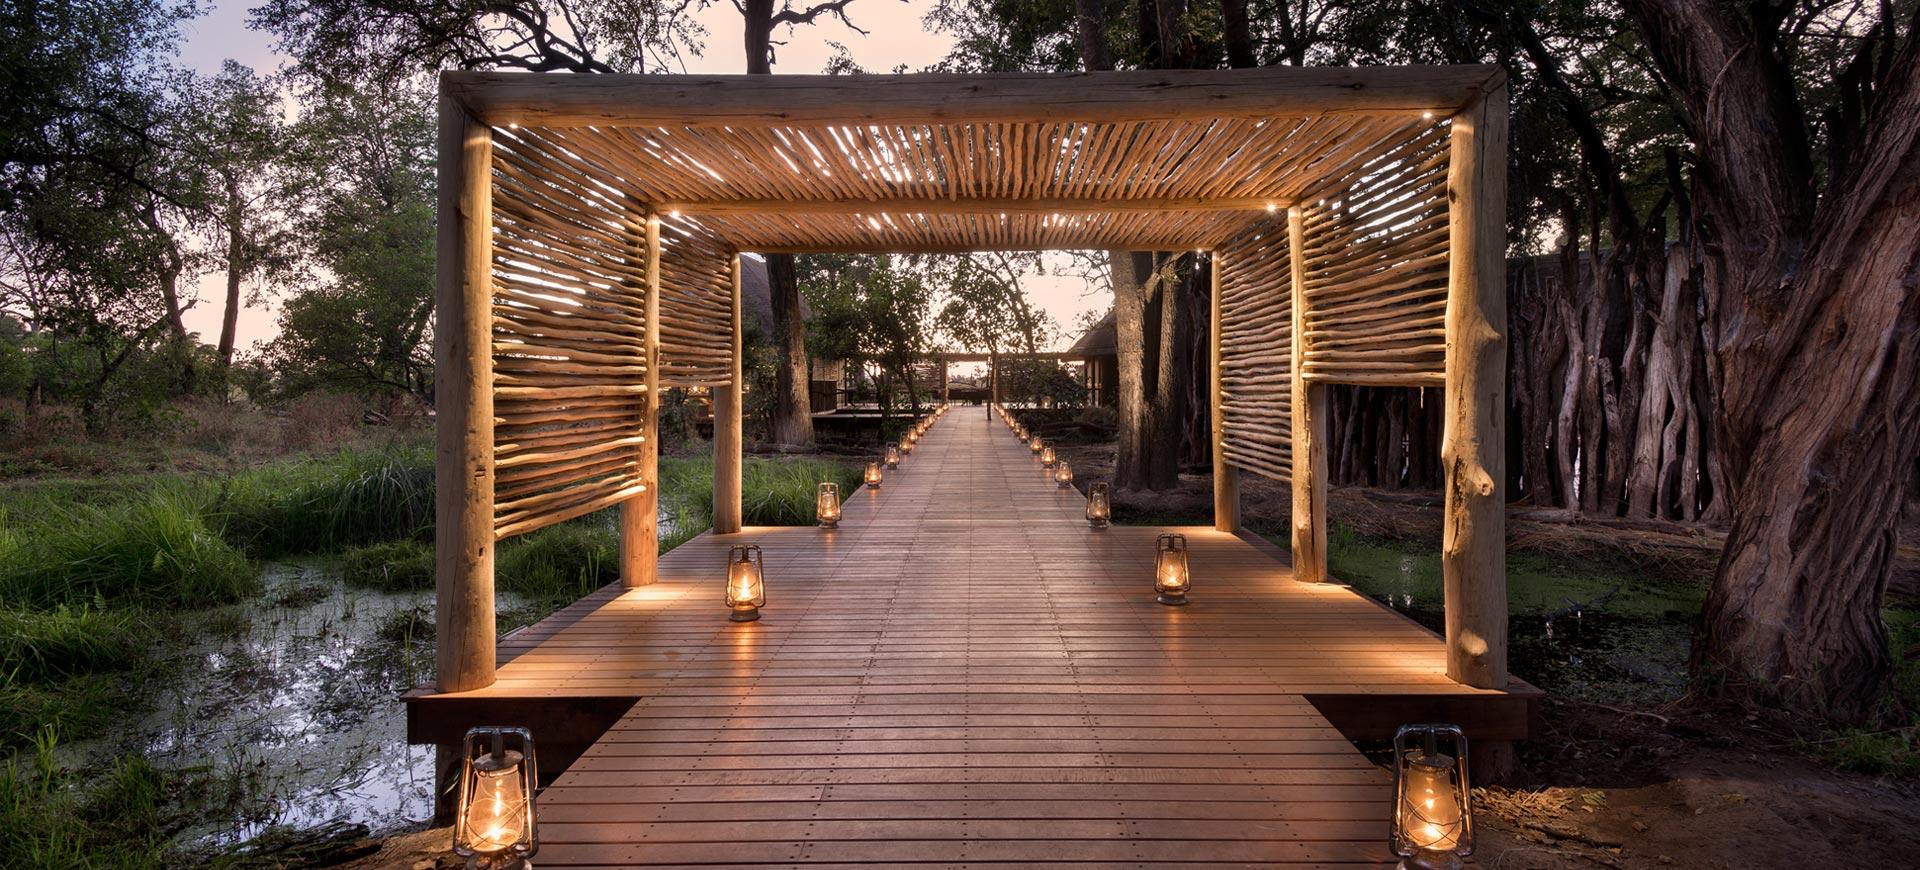 Nxabega Tented Camp Okavango